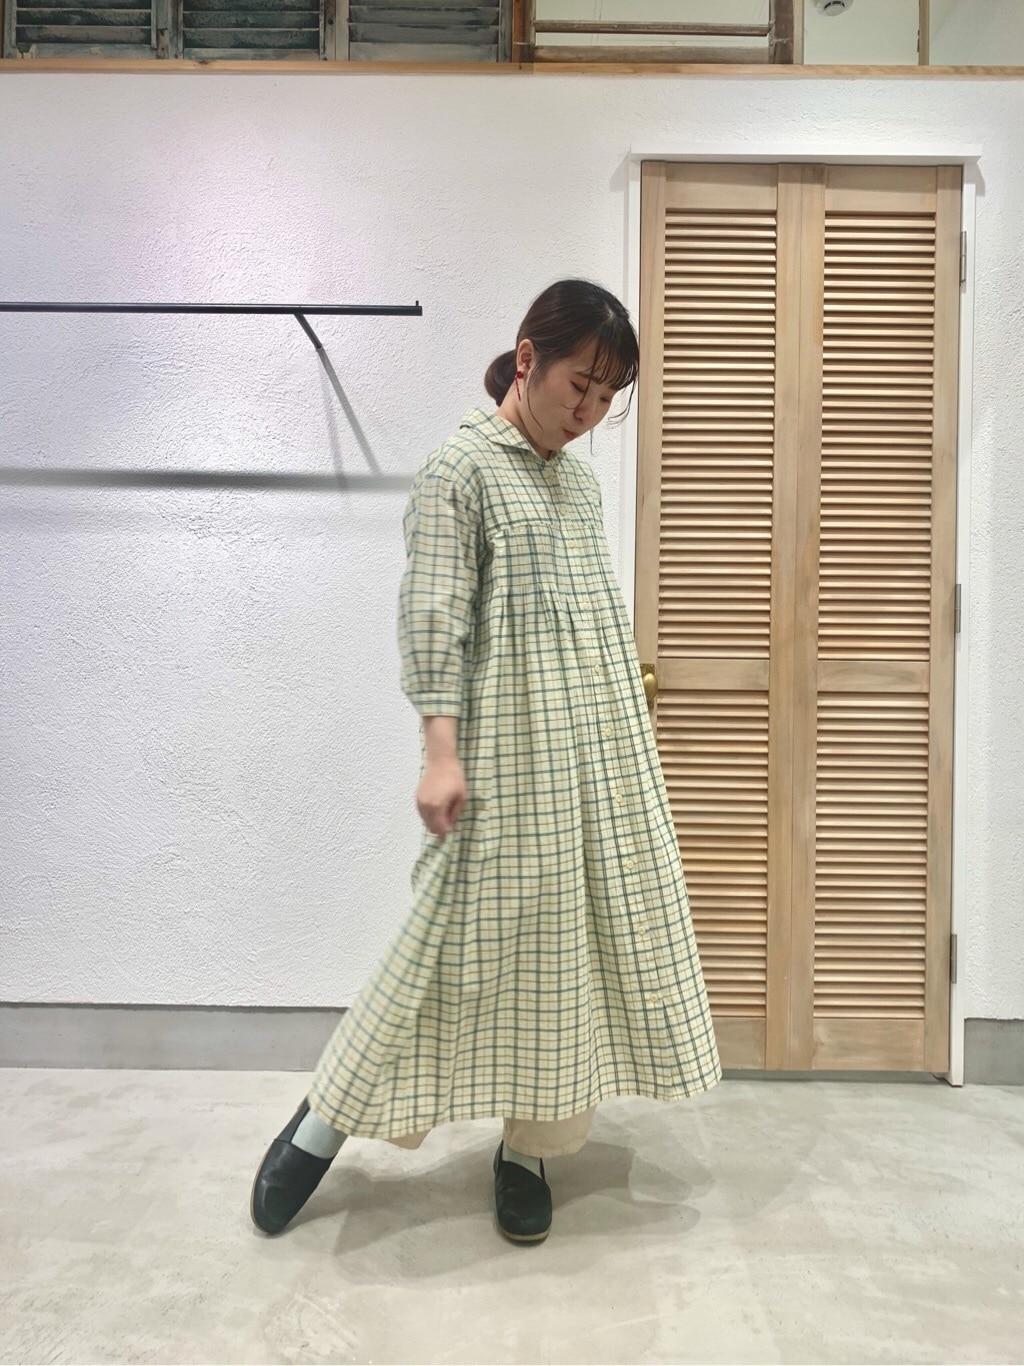 chambre de charme 横浜ジョイナス 身長:155cm 2020.08.13